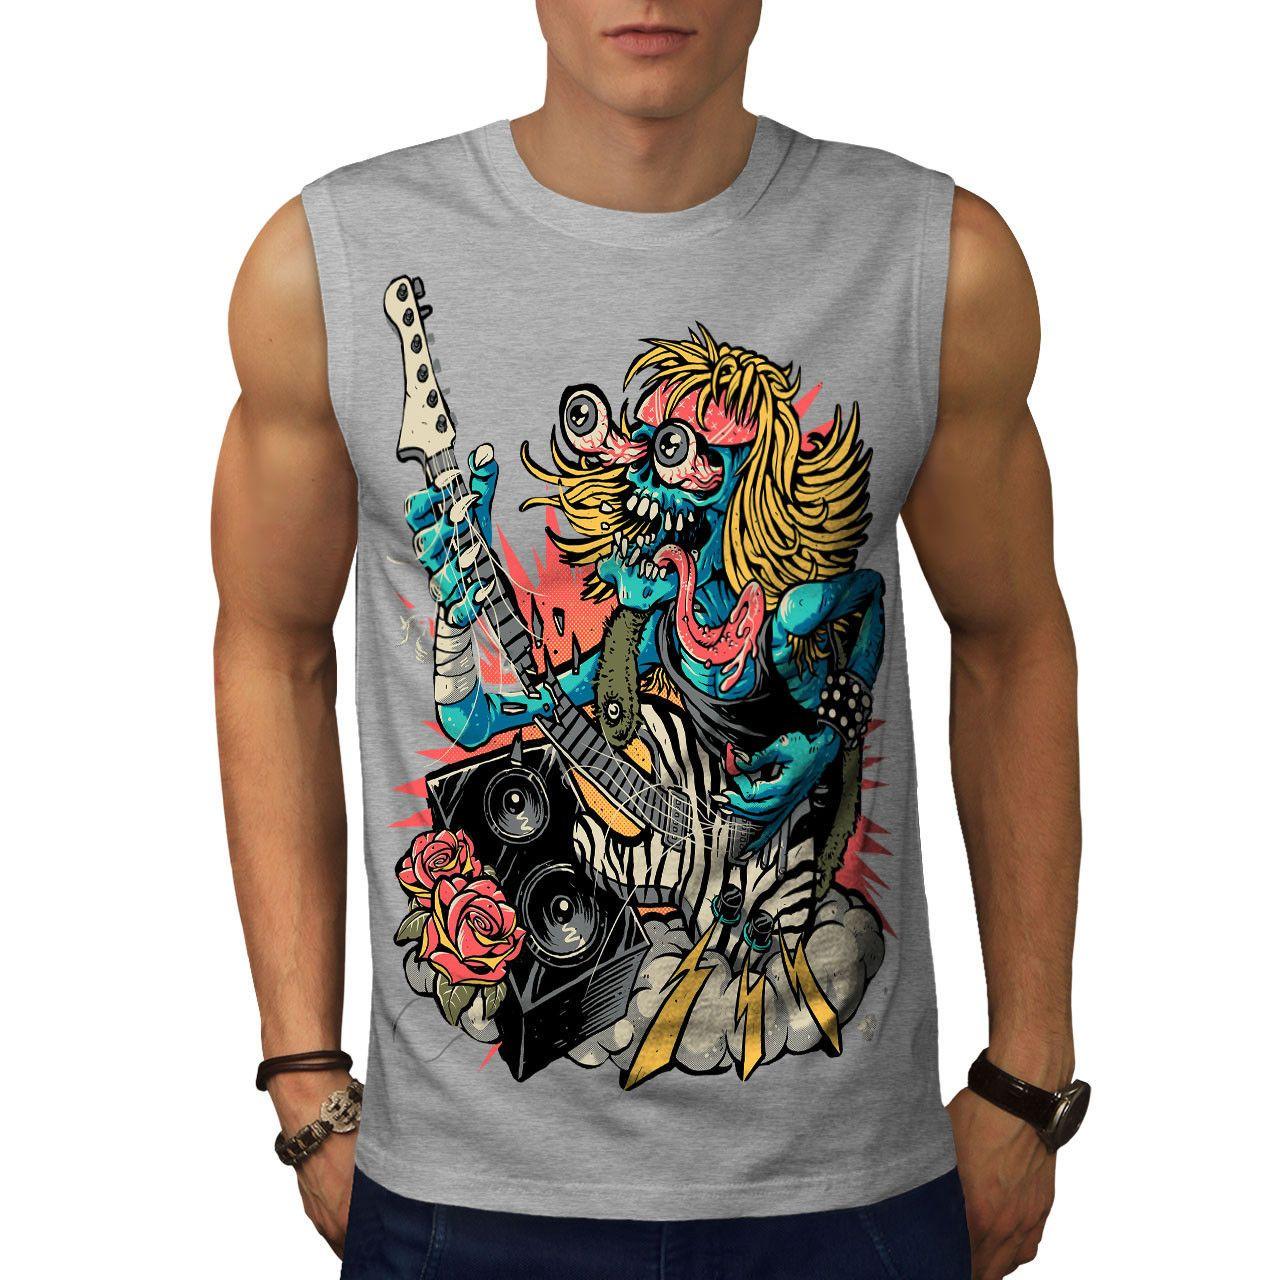 ee5eb5691 Rock Band Guitar Music Men Sleeveless T Shirt NEW | Wellcoda Funny ...